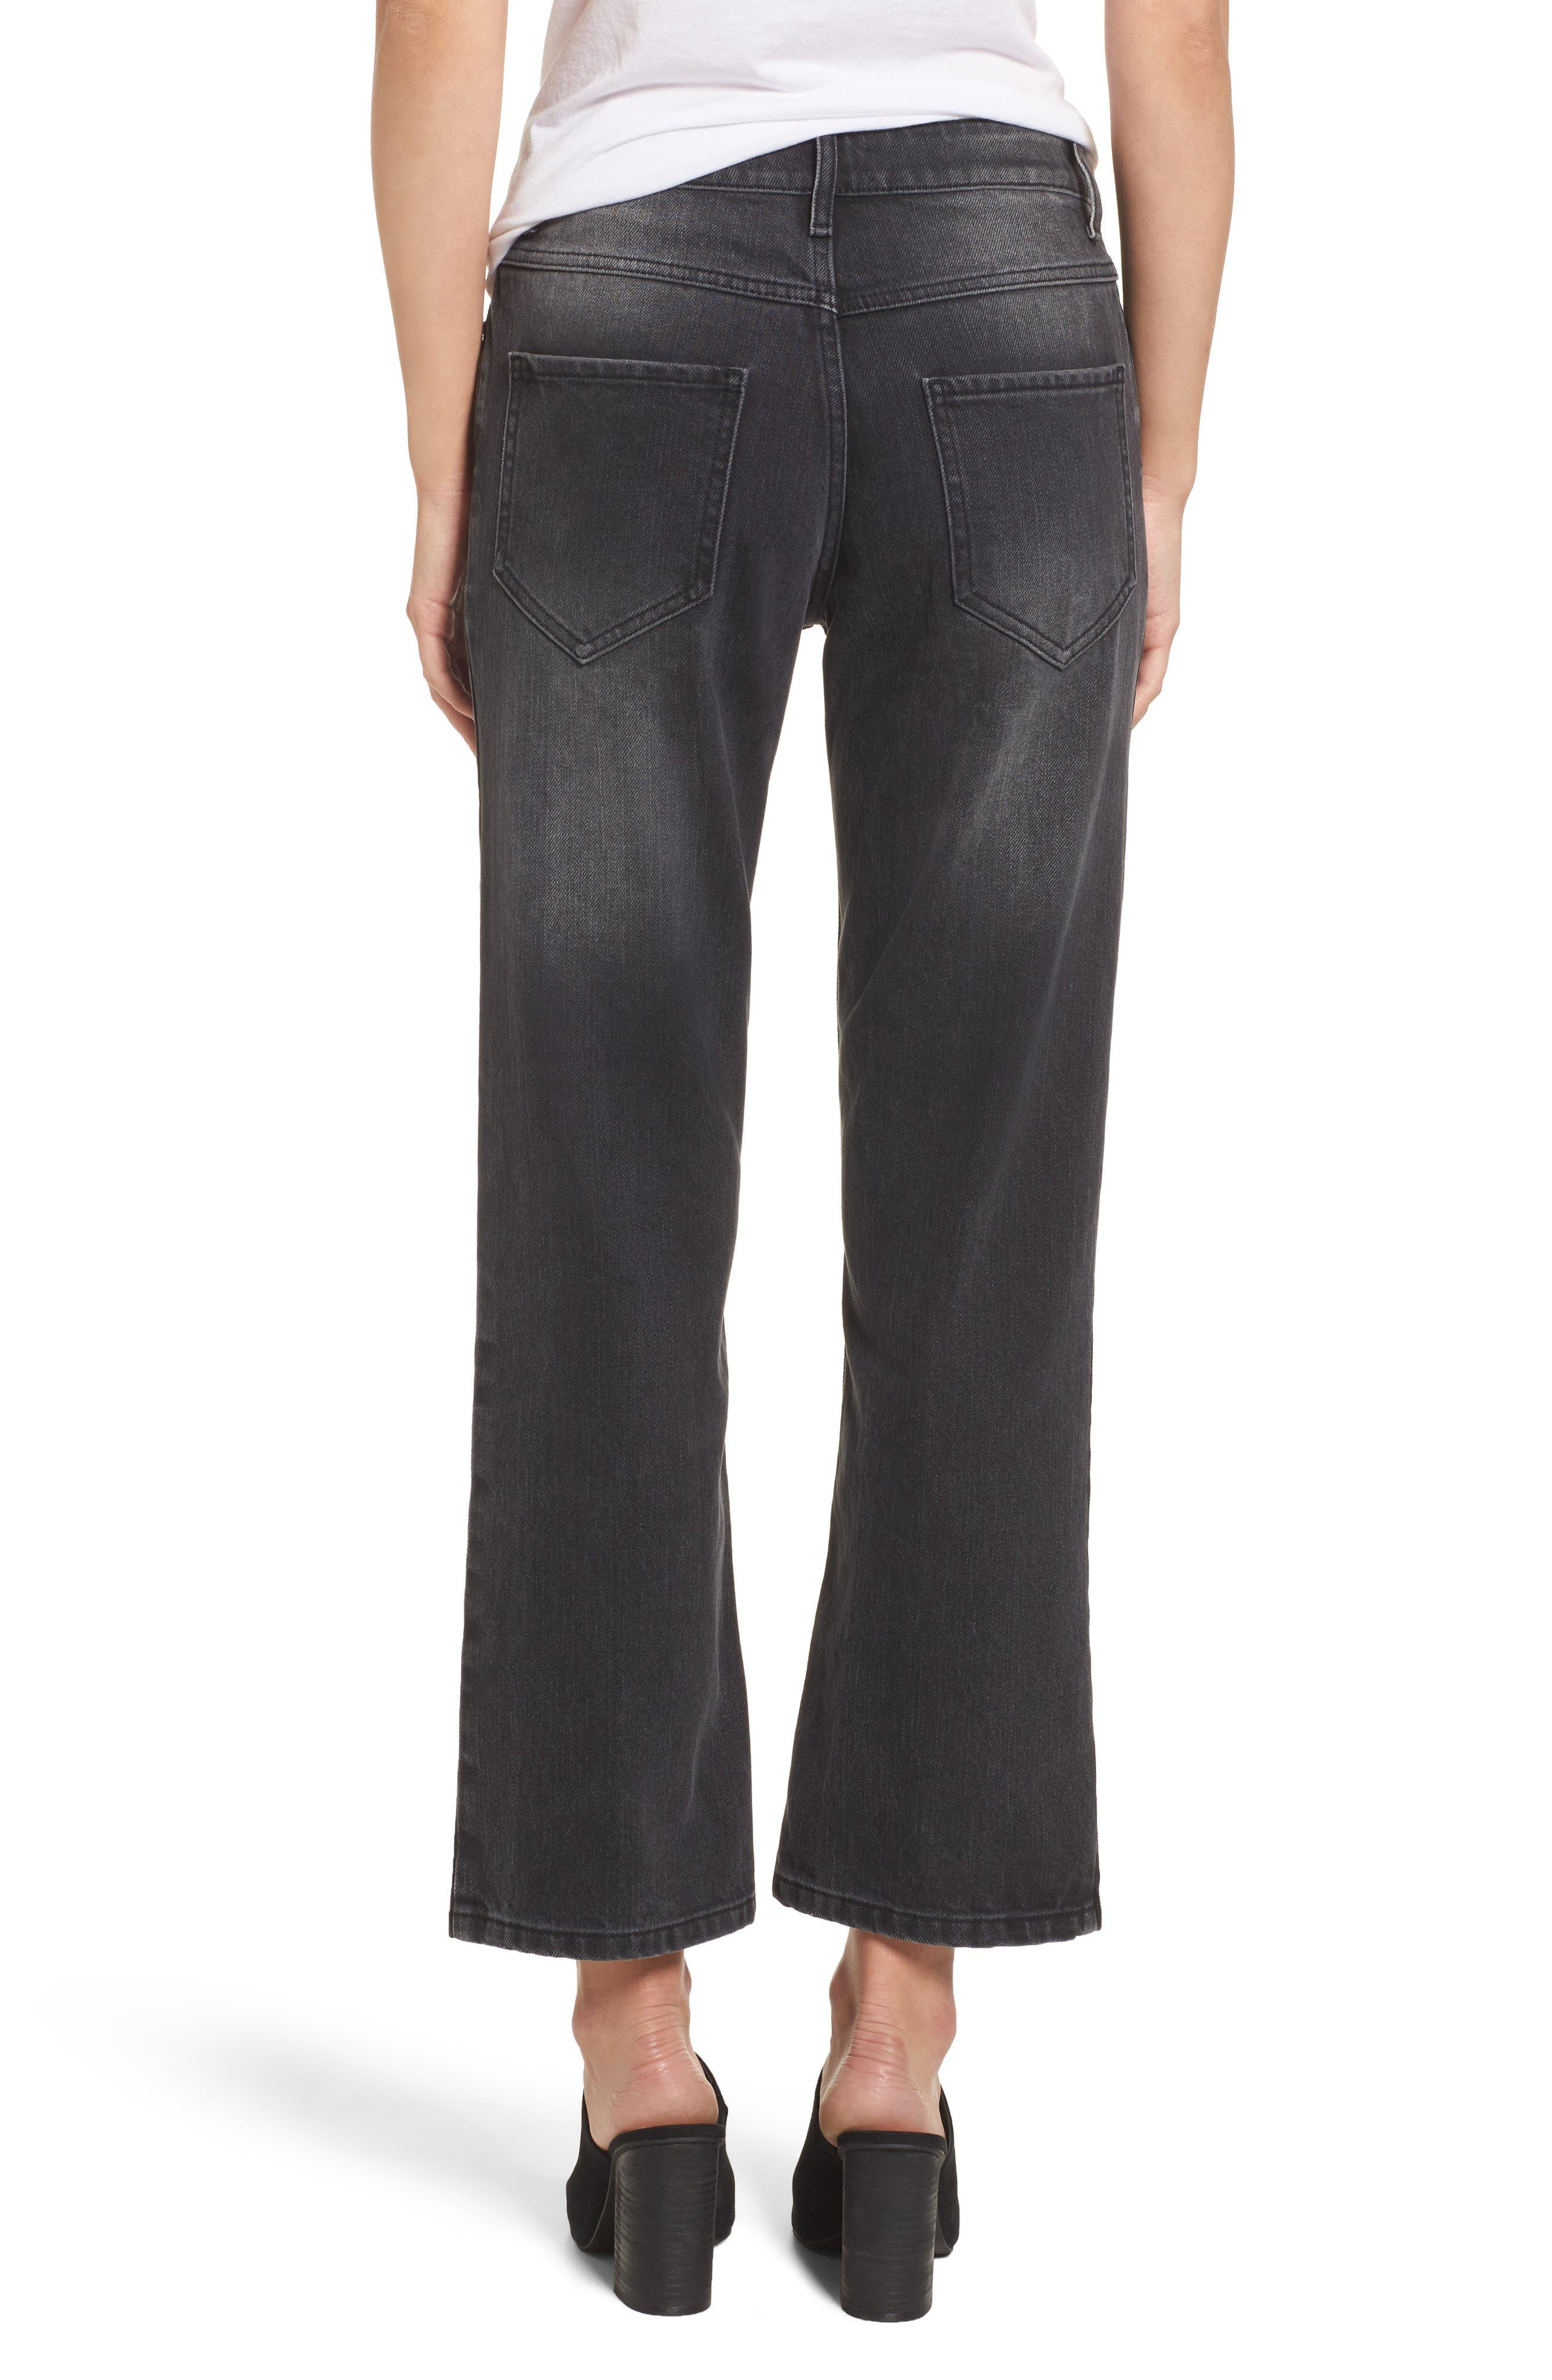 Alternate Image 2  - Sincerely Jules High Waist Crop Flare Jeans (Washed Black)